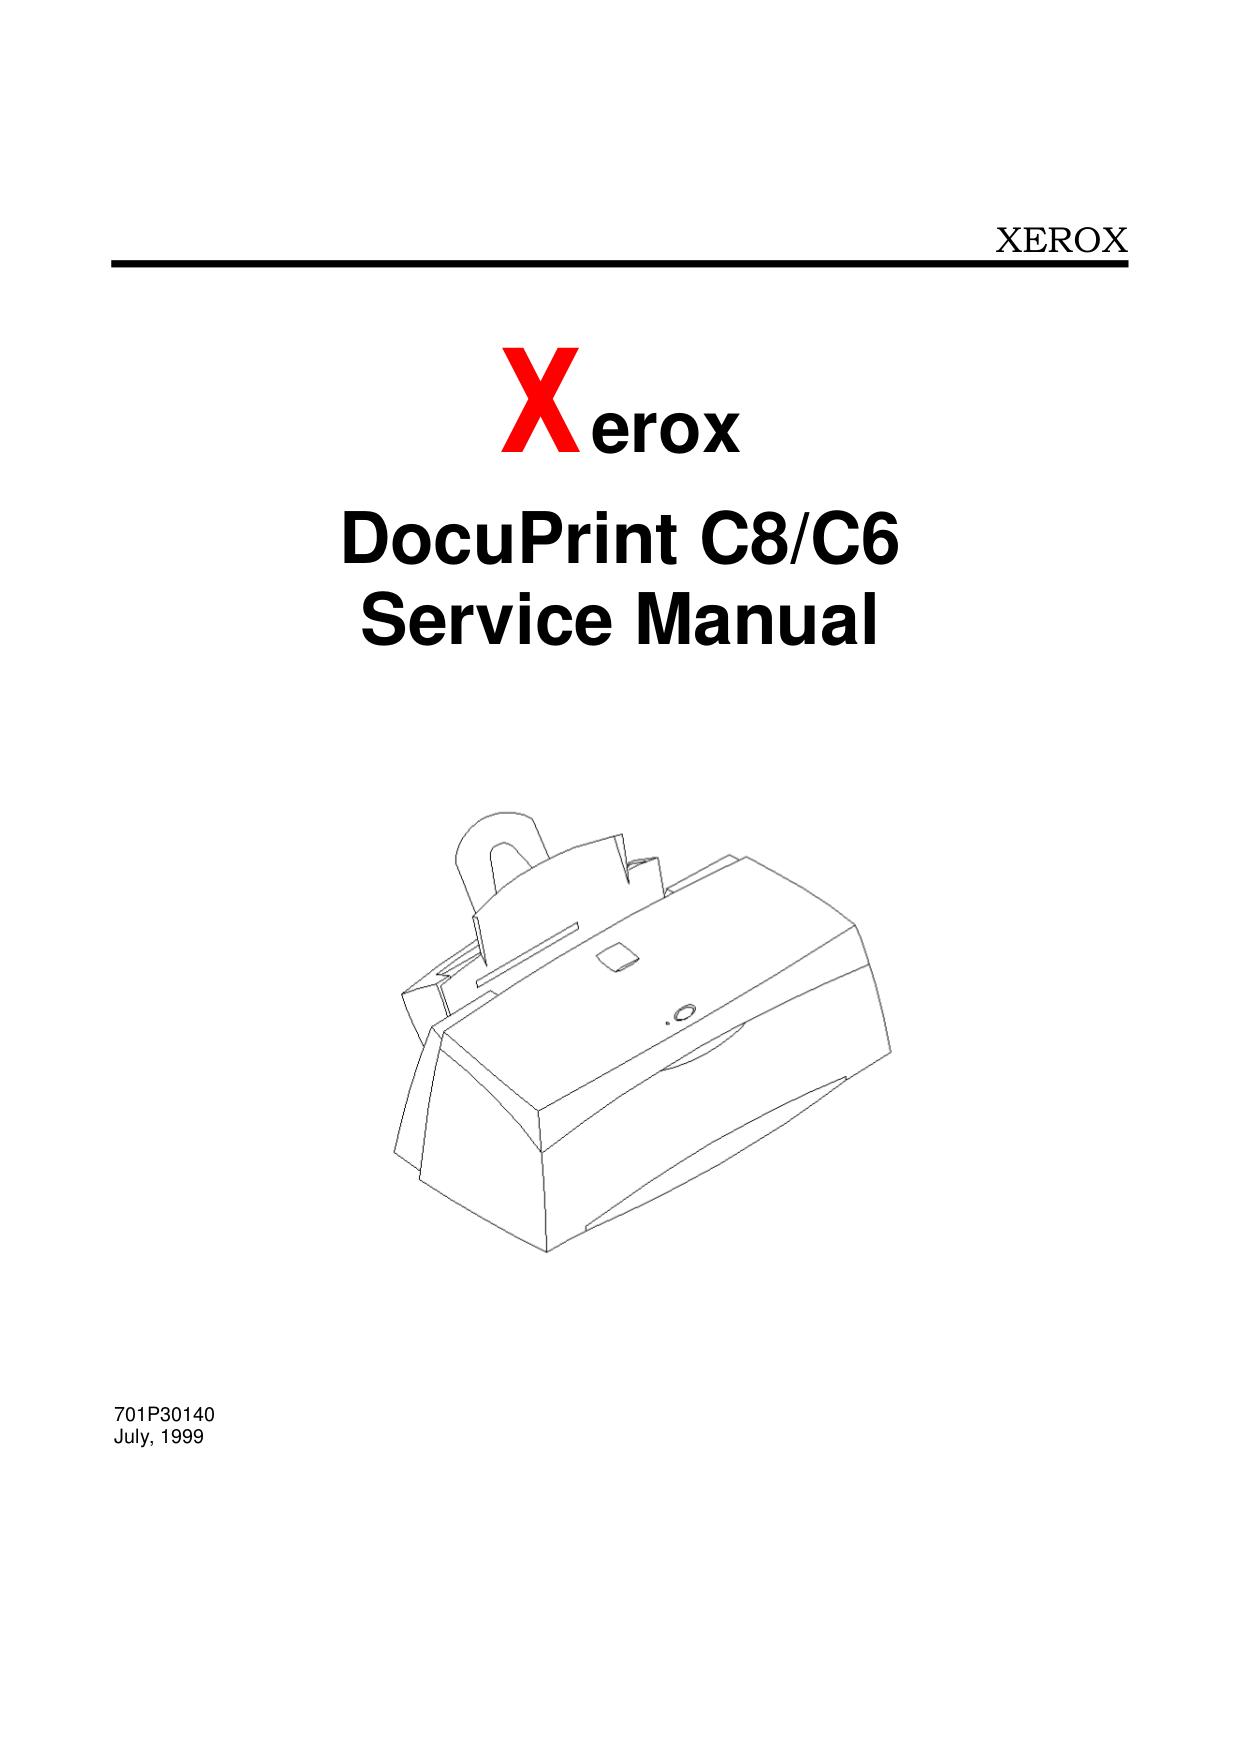 pdf for Xerox Printer DocuPrint C8 manual